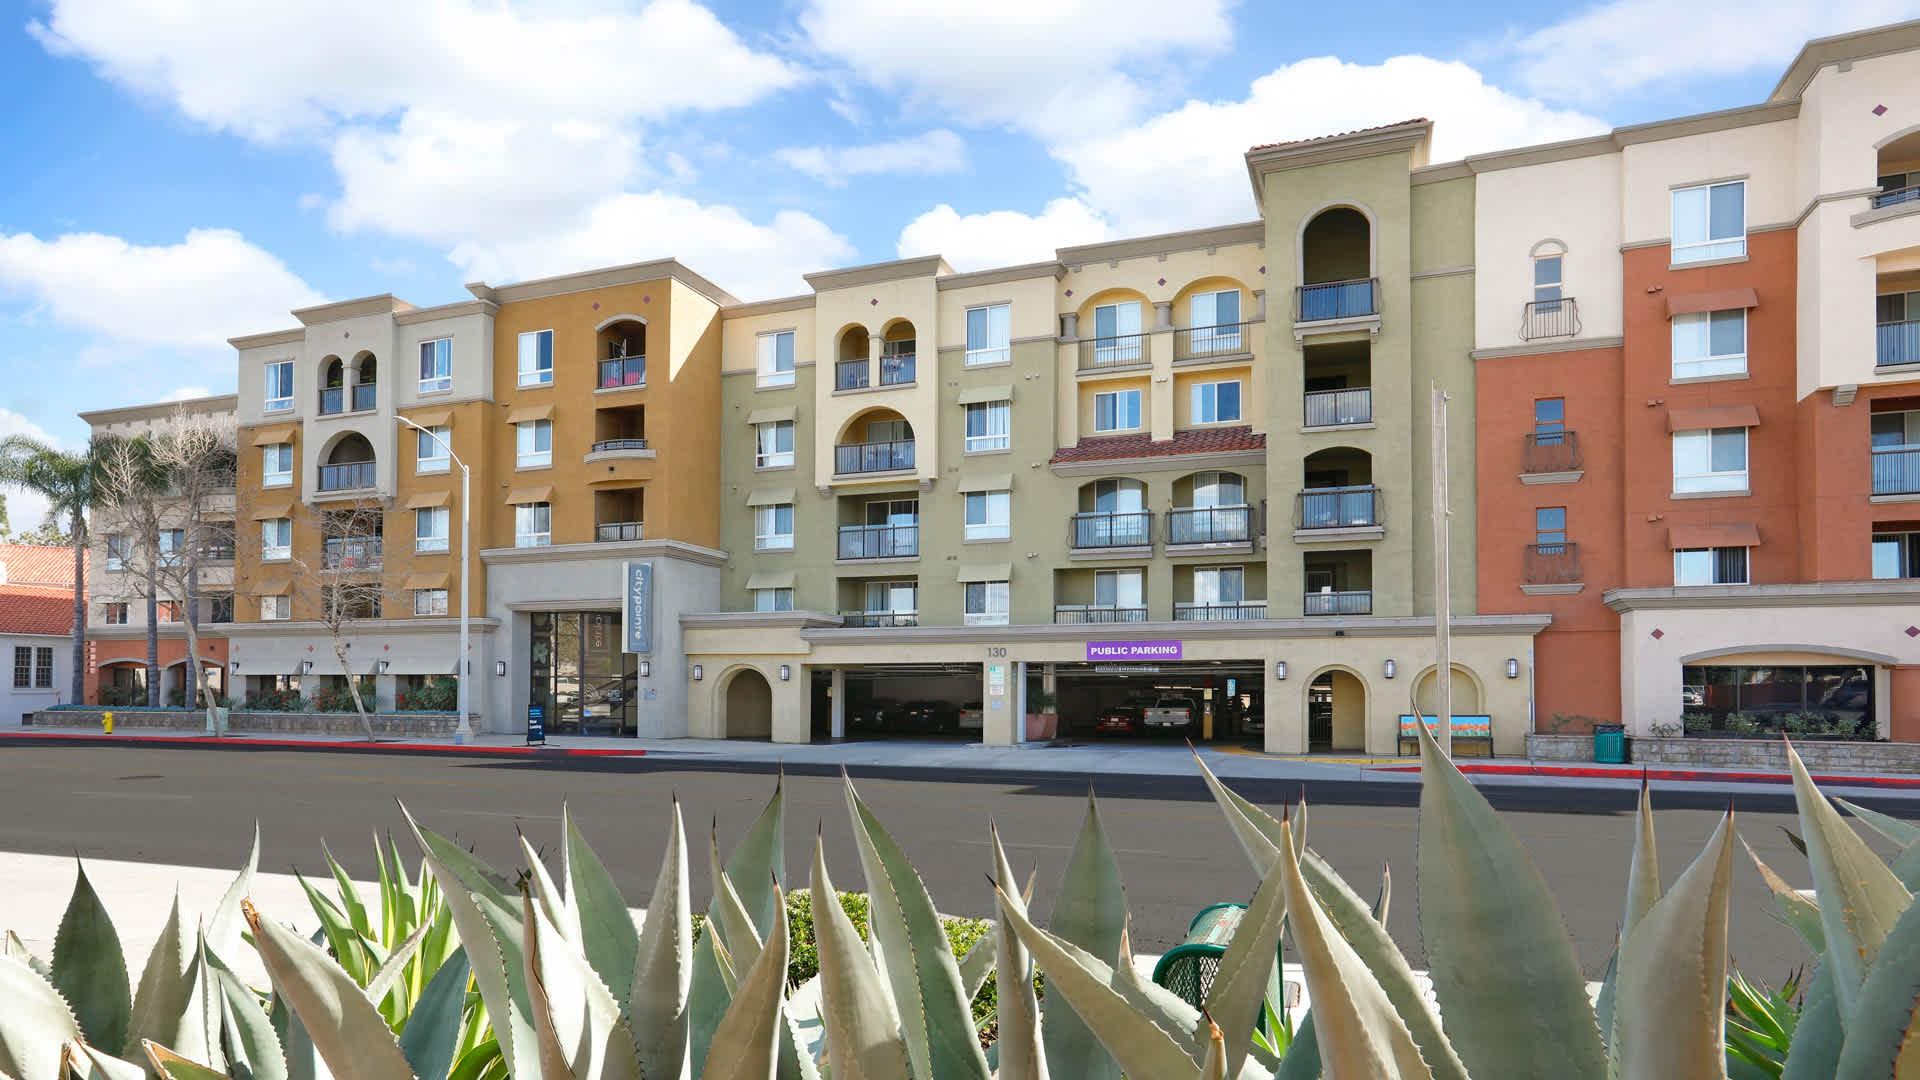 Apartments Near Fullerton College City Pointe for Fullerton College Students in Fullerton, CA